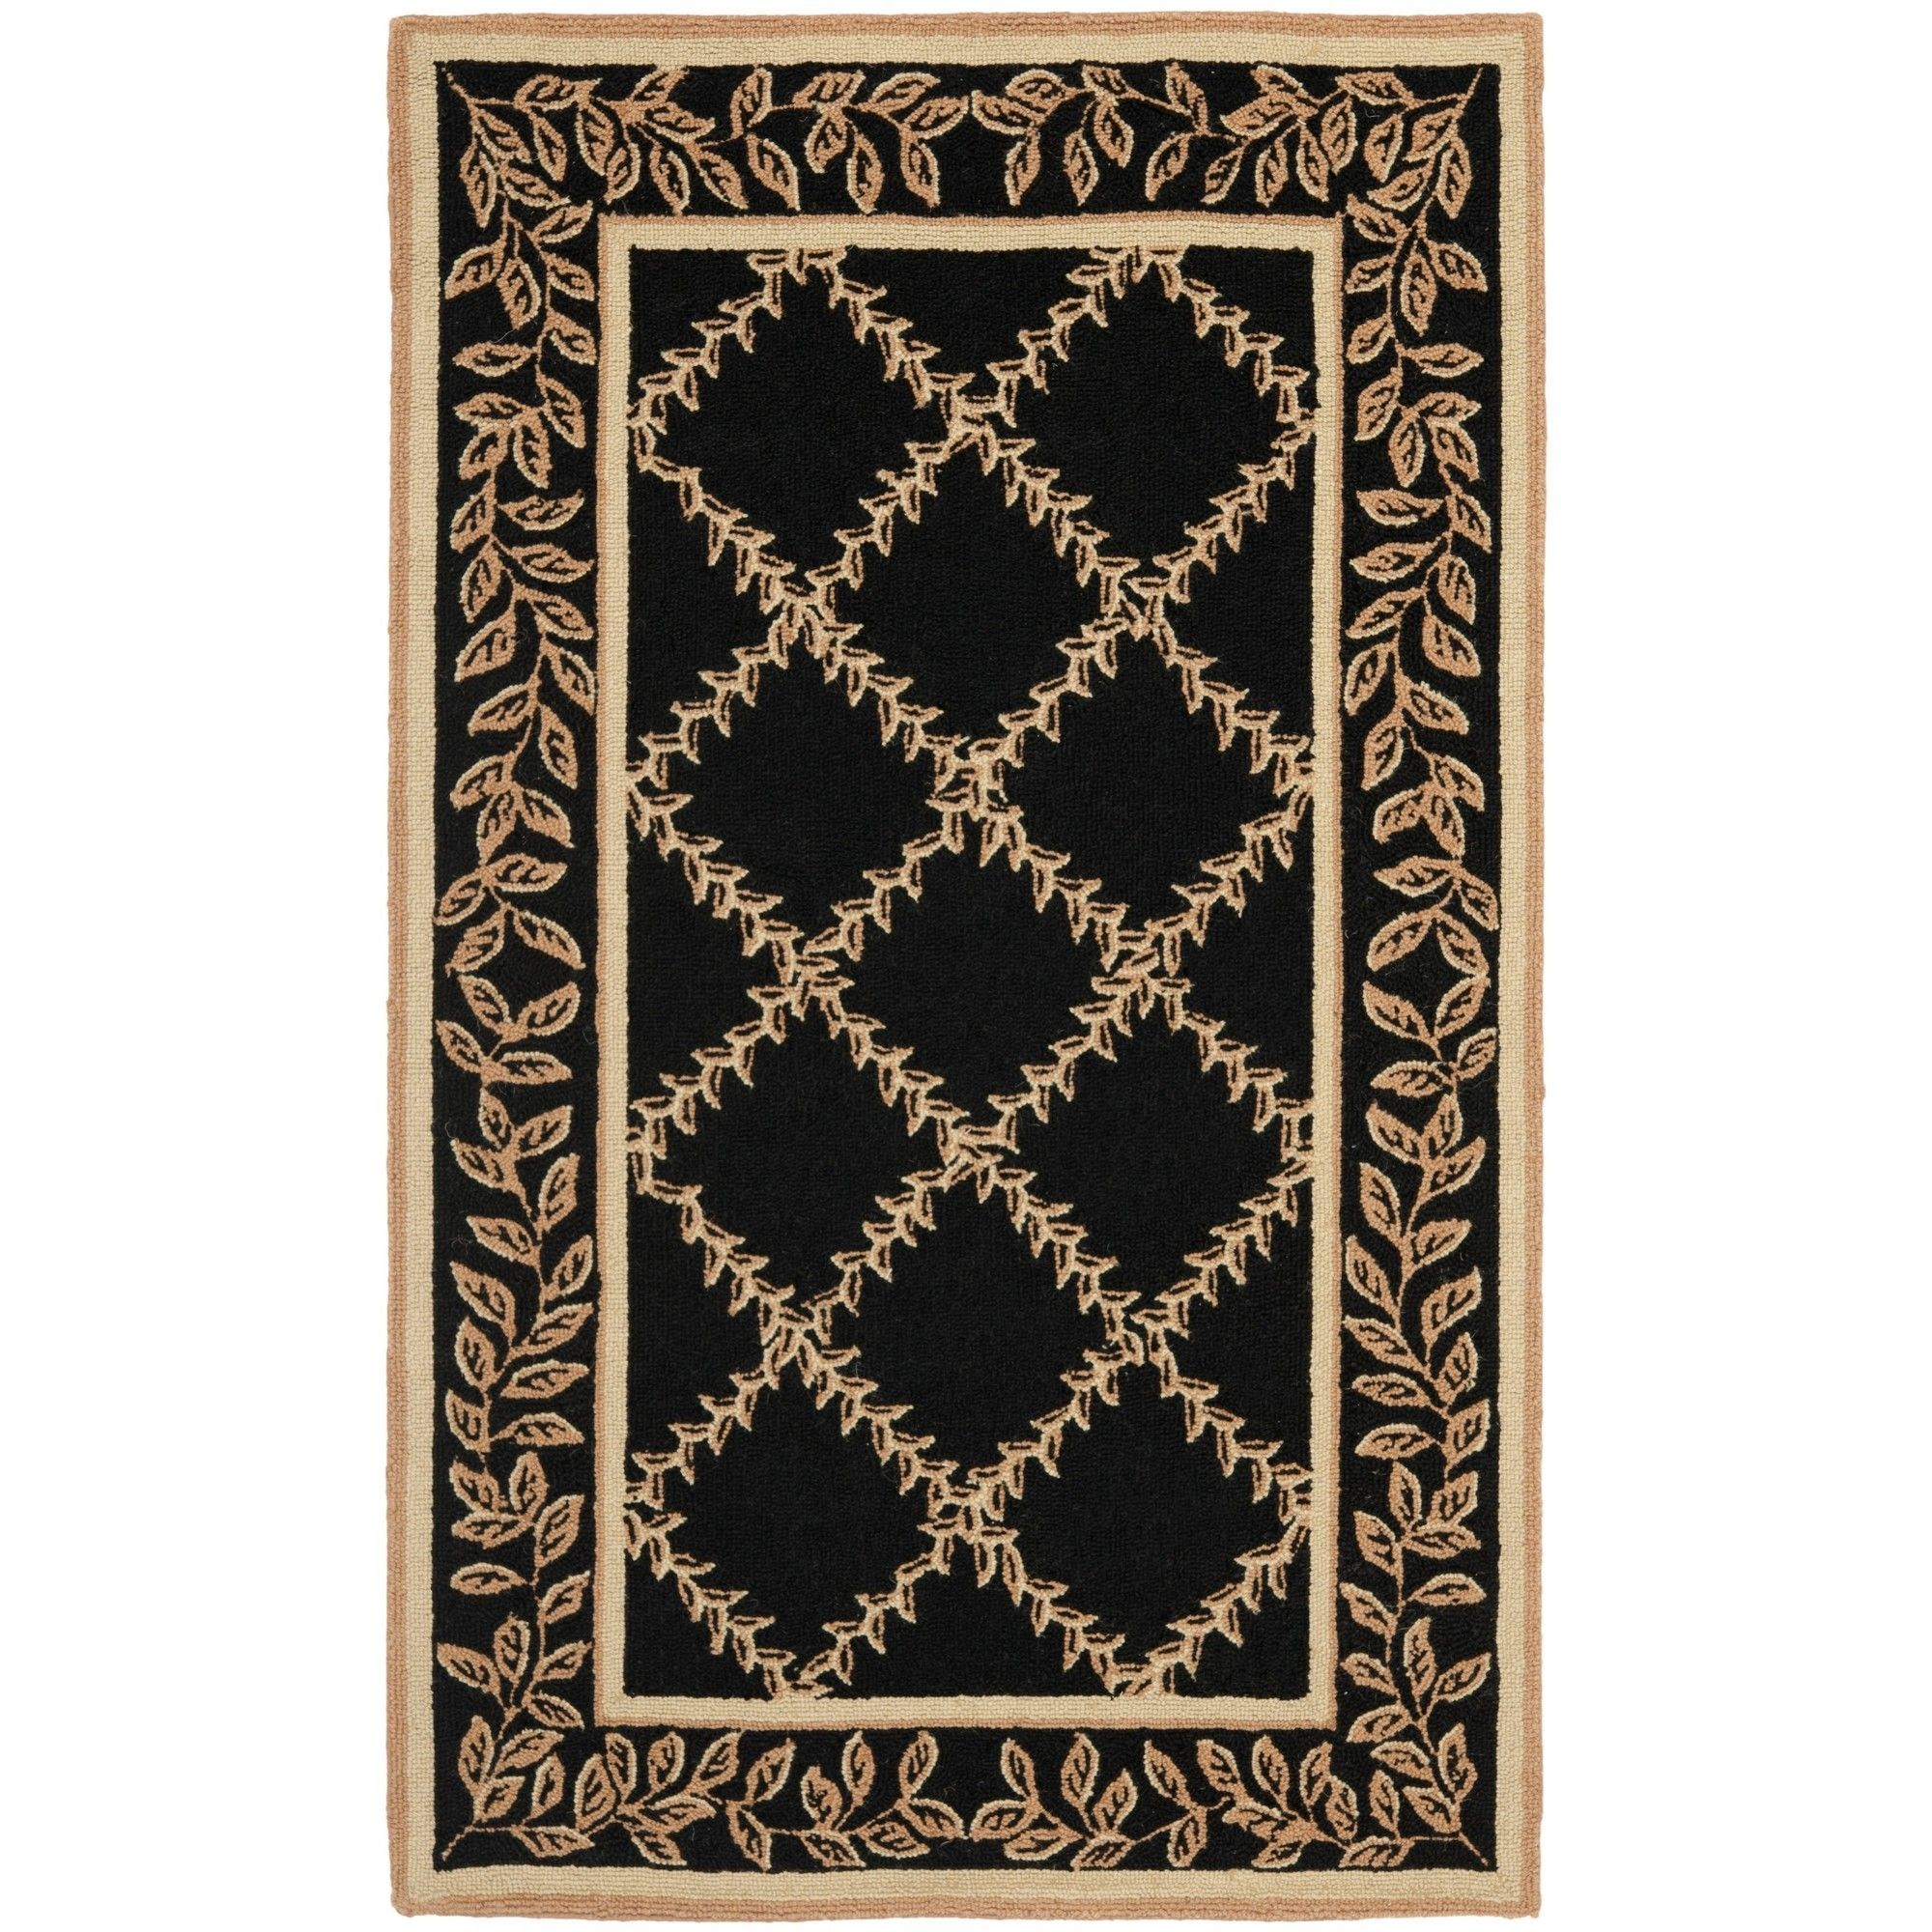 chelsea black  gold wilton trellis area rug. chelsea black  gold wilton trellis area rug  products